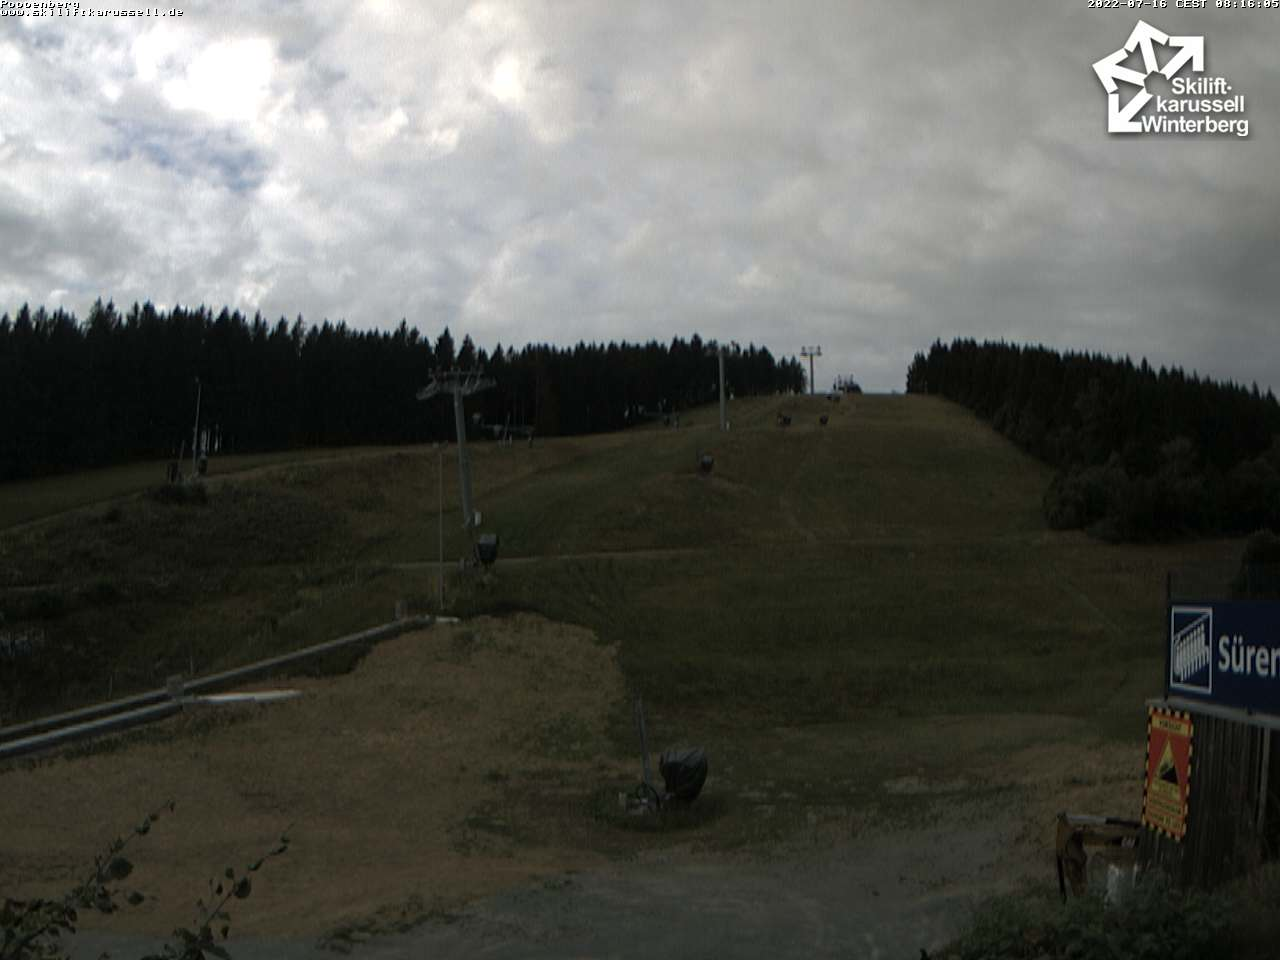 Webcam Ski Resort Brilon - Am Poppenberg cam 5 - Sauerland